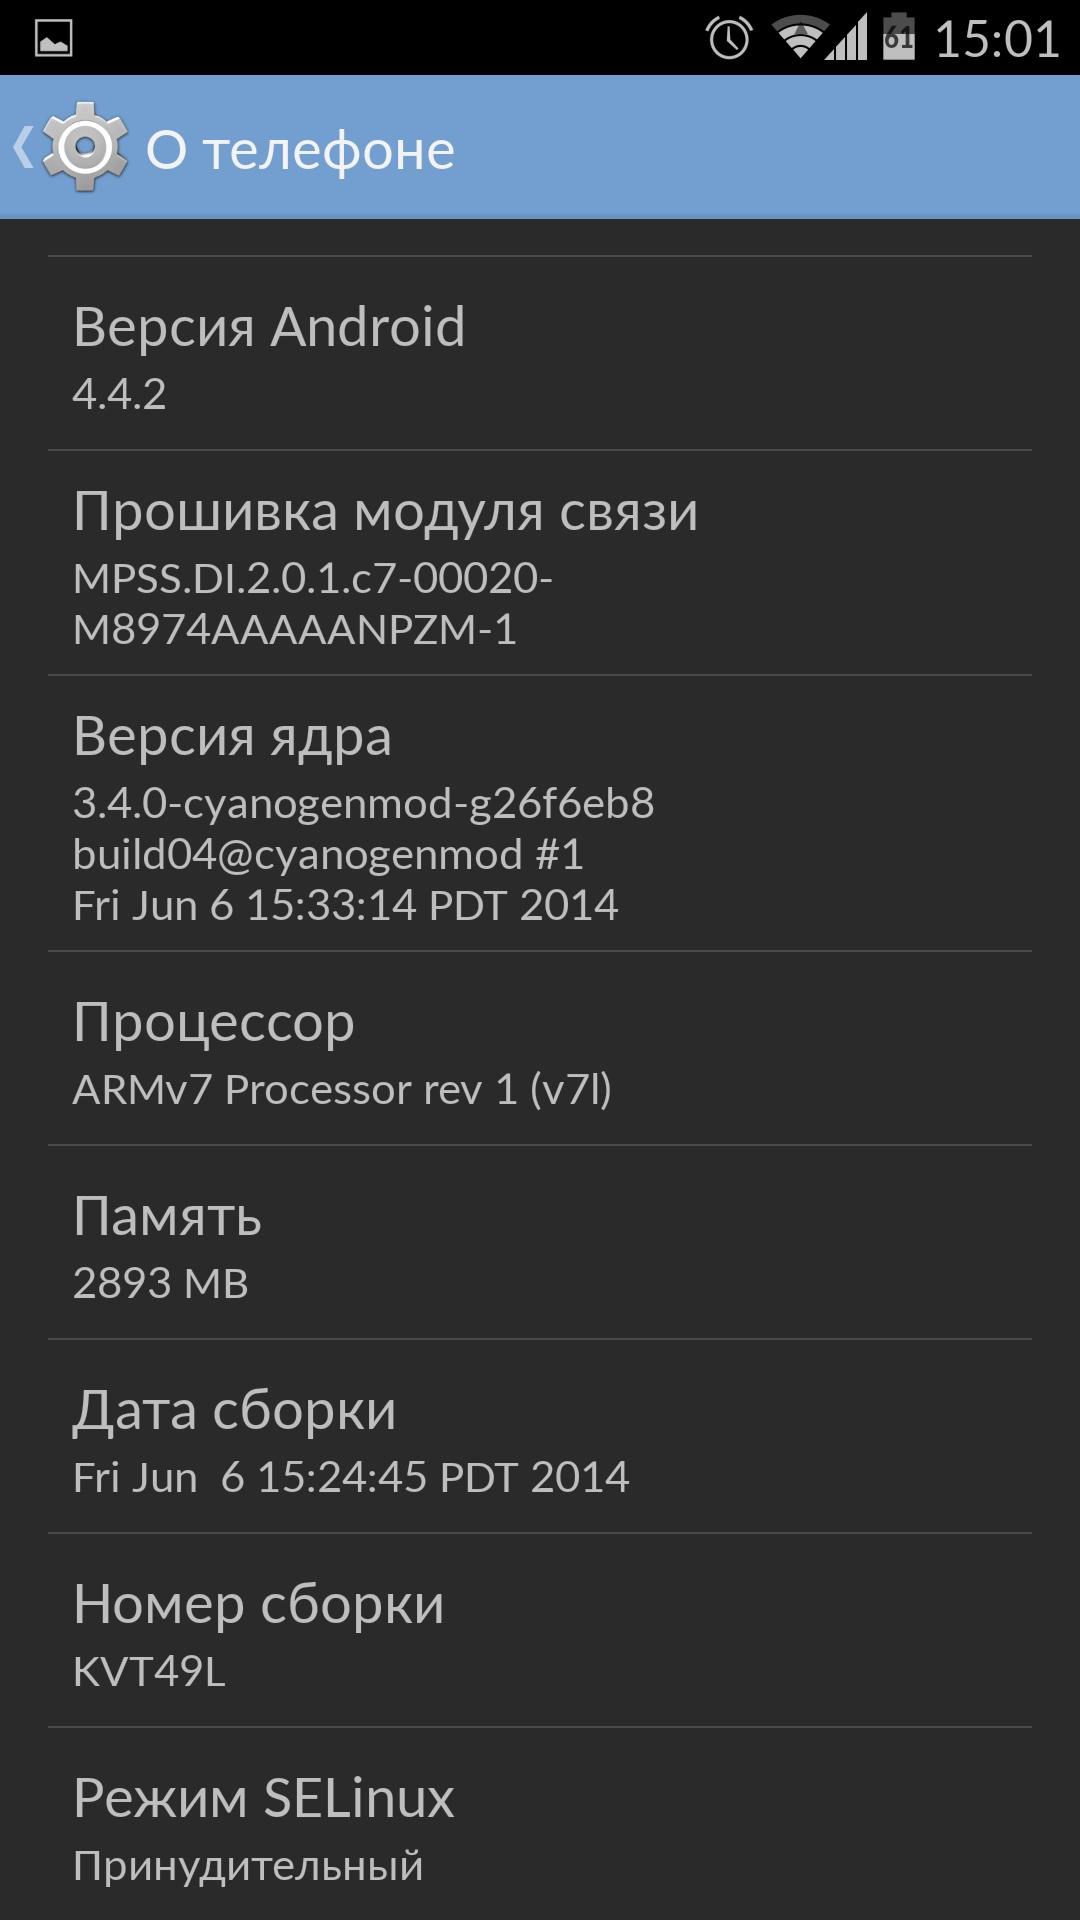 https://hd.zp.ua/wp-content/uploads/2015/08/2014-07-02-11-01-195.png